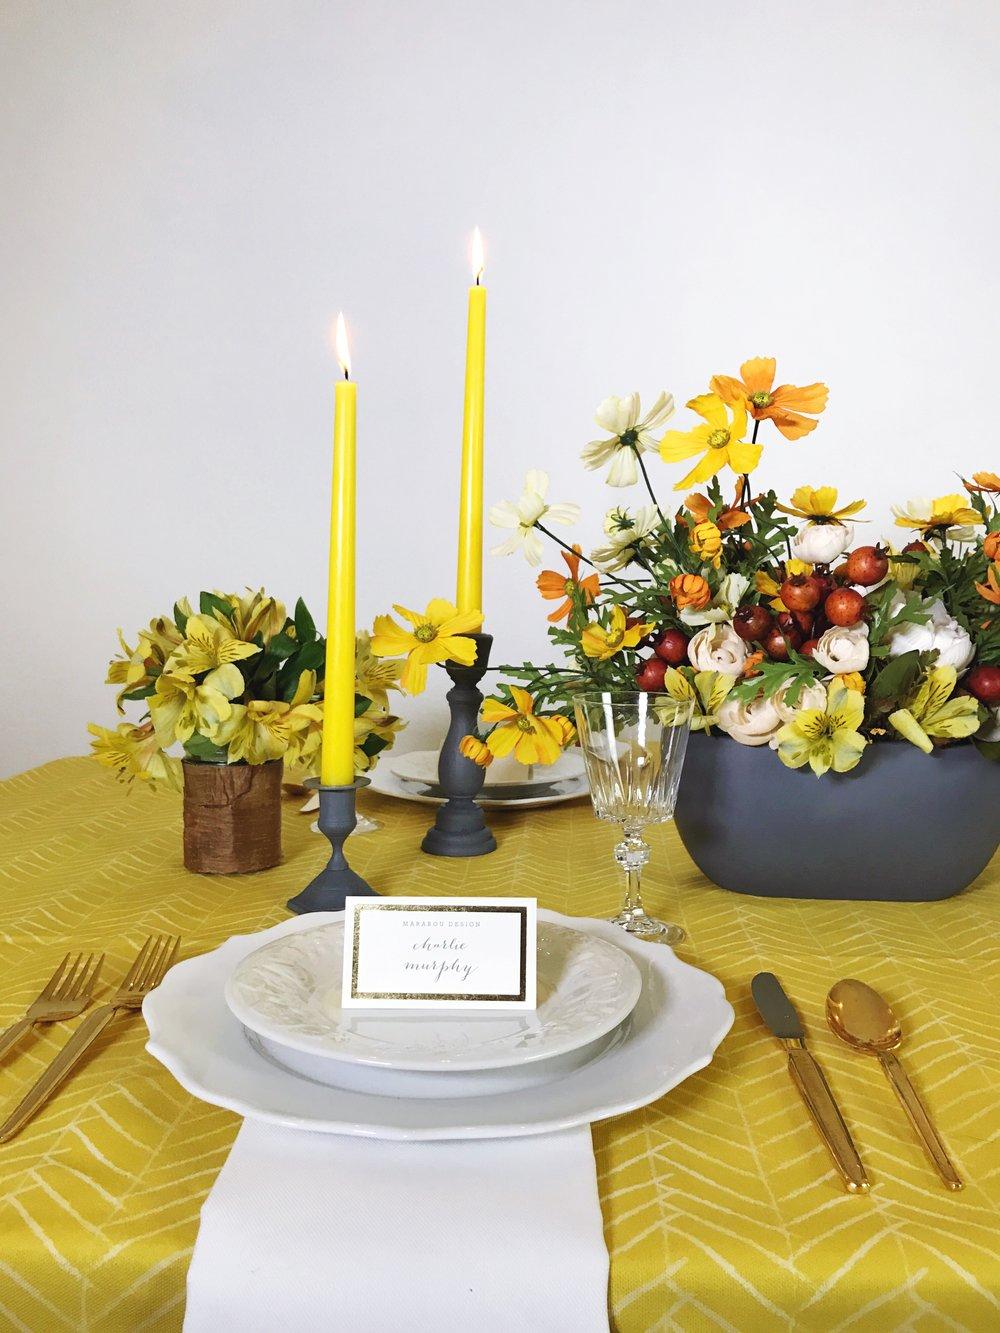 Original_Marabou-Design-Homemade-Harvest-Centerpiece-Beauty-2.JPG